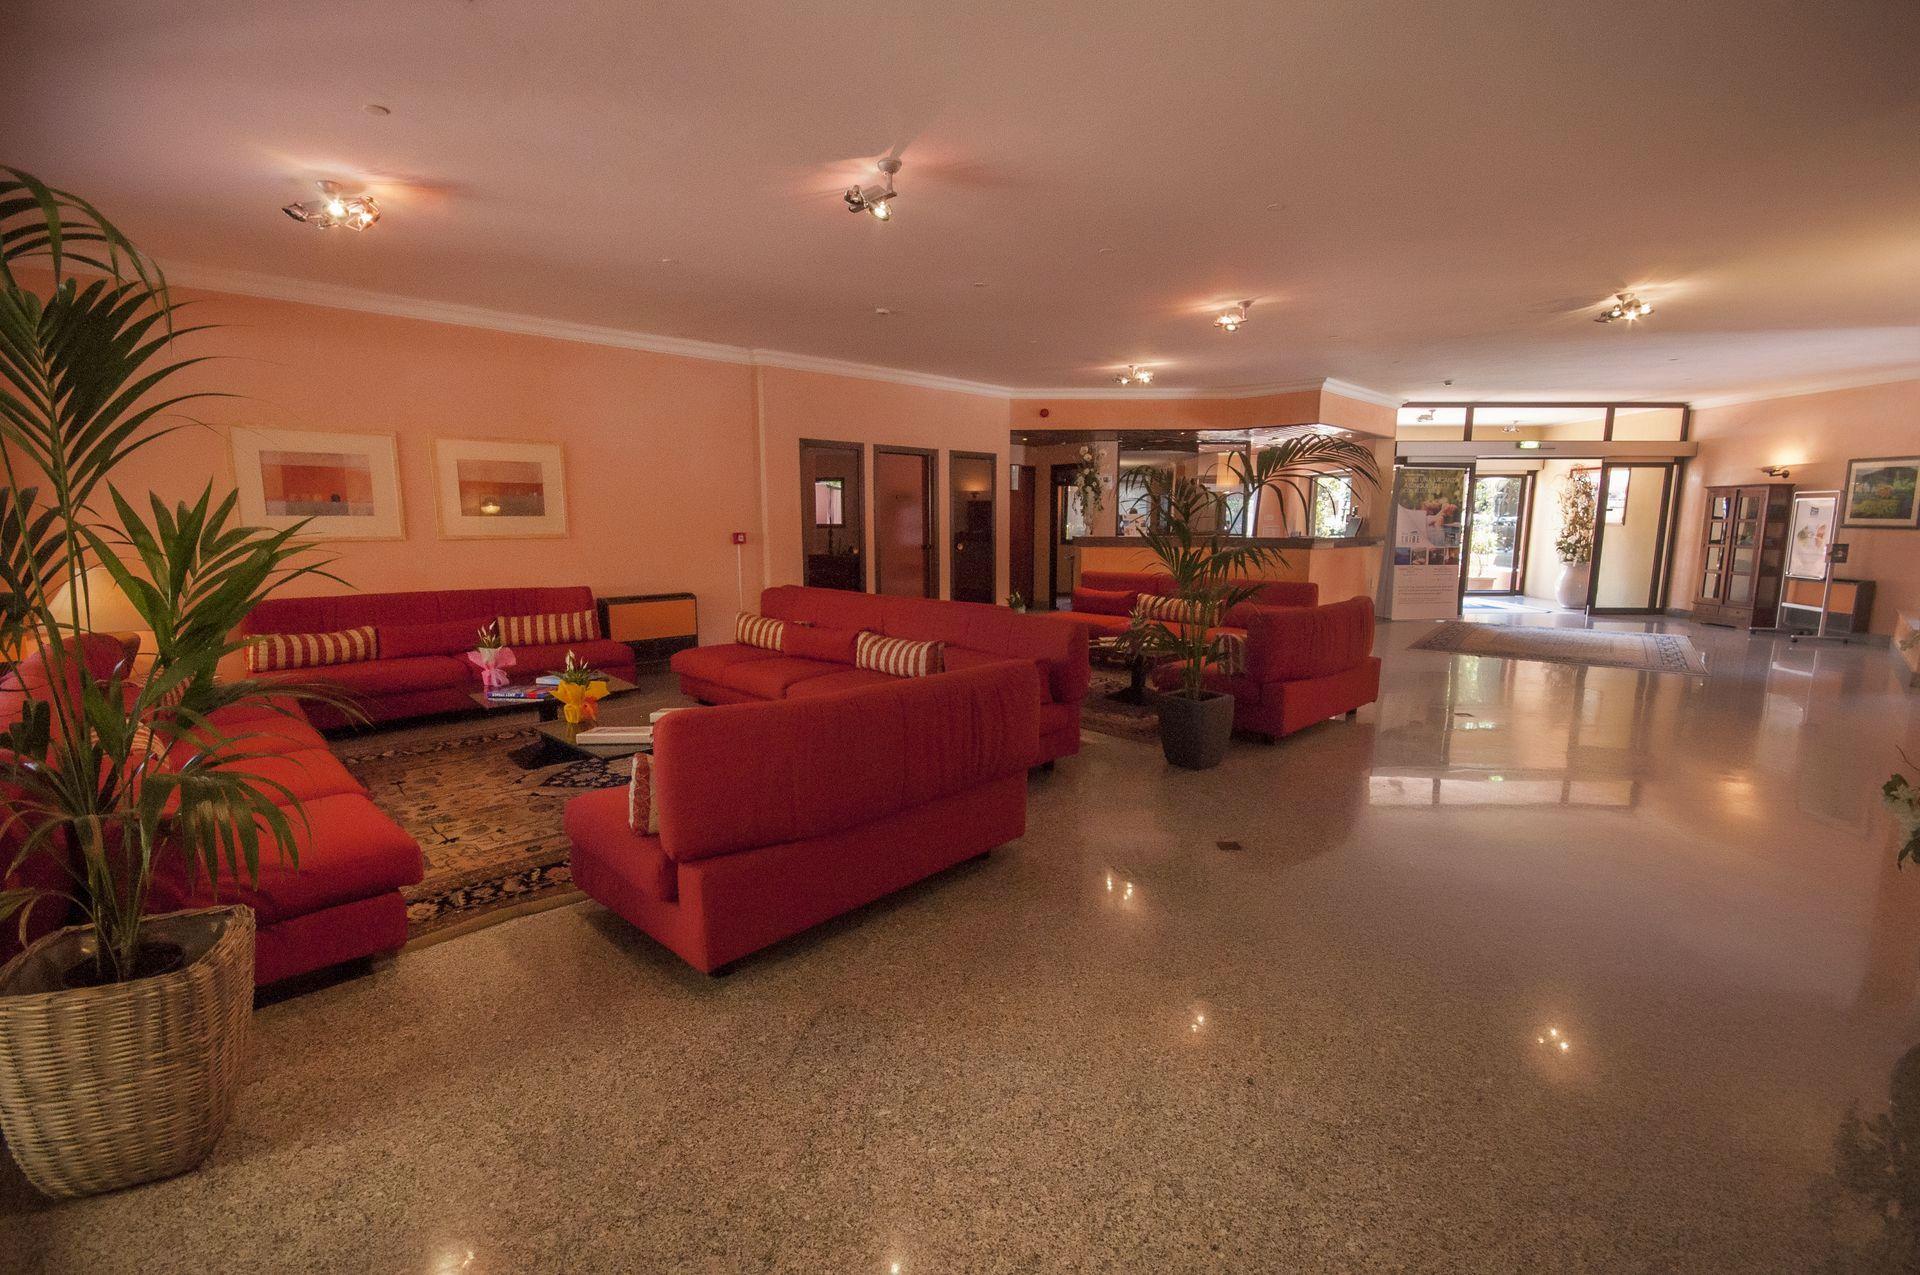 a983737a87 Cristina park hotel montesarchio foto